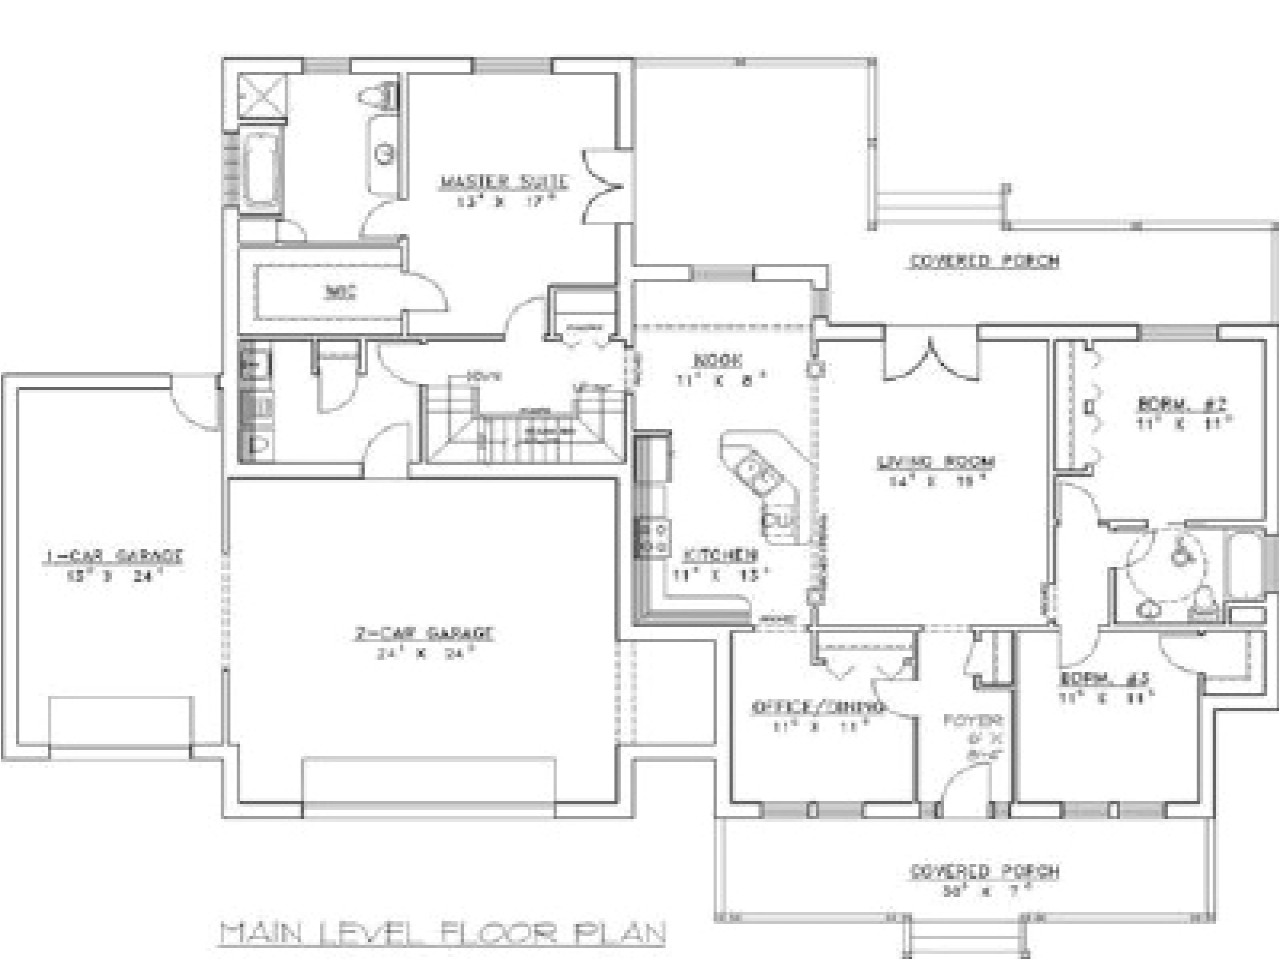 37b1303aac3a120b insulated concrete form house plans concrete house plans designs